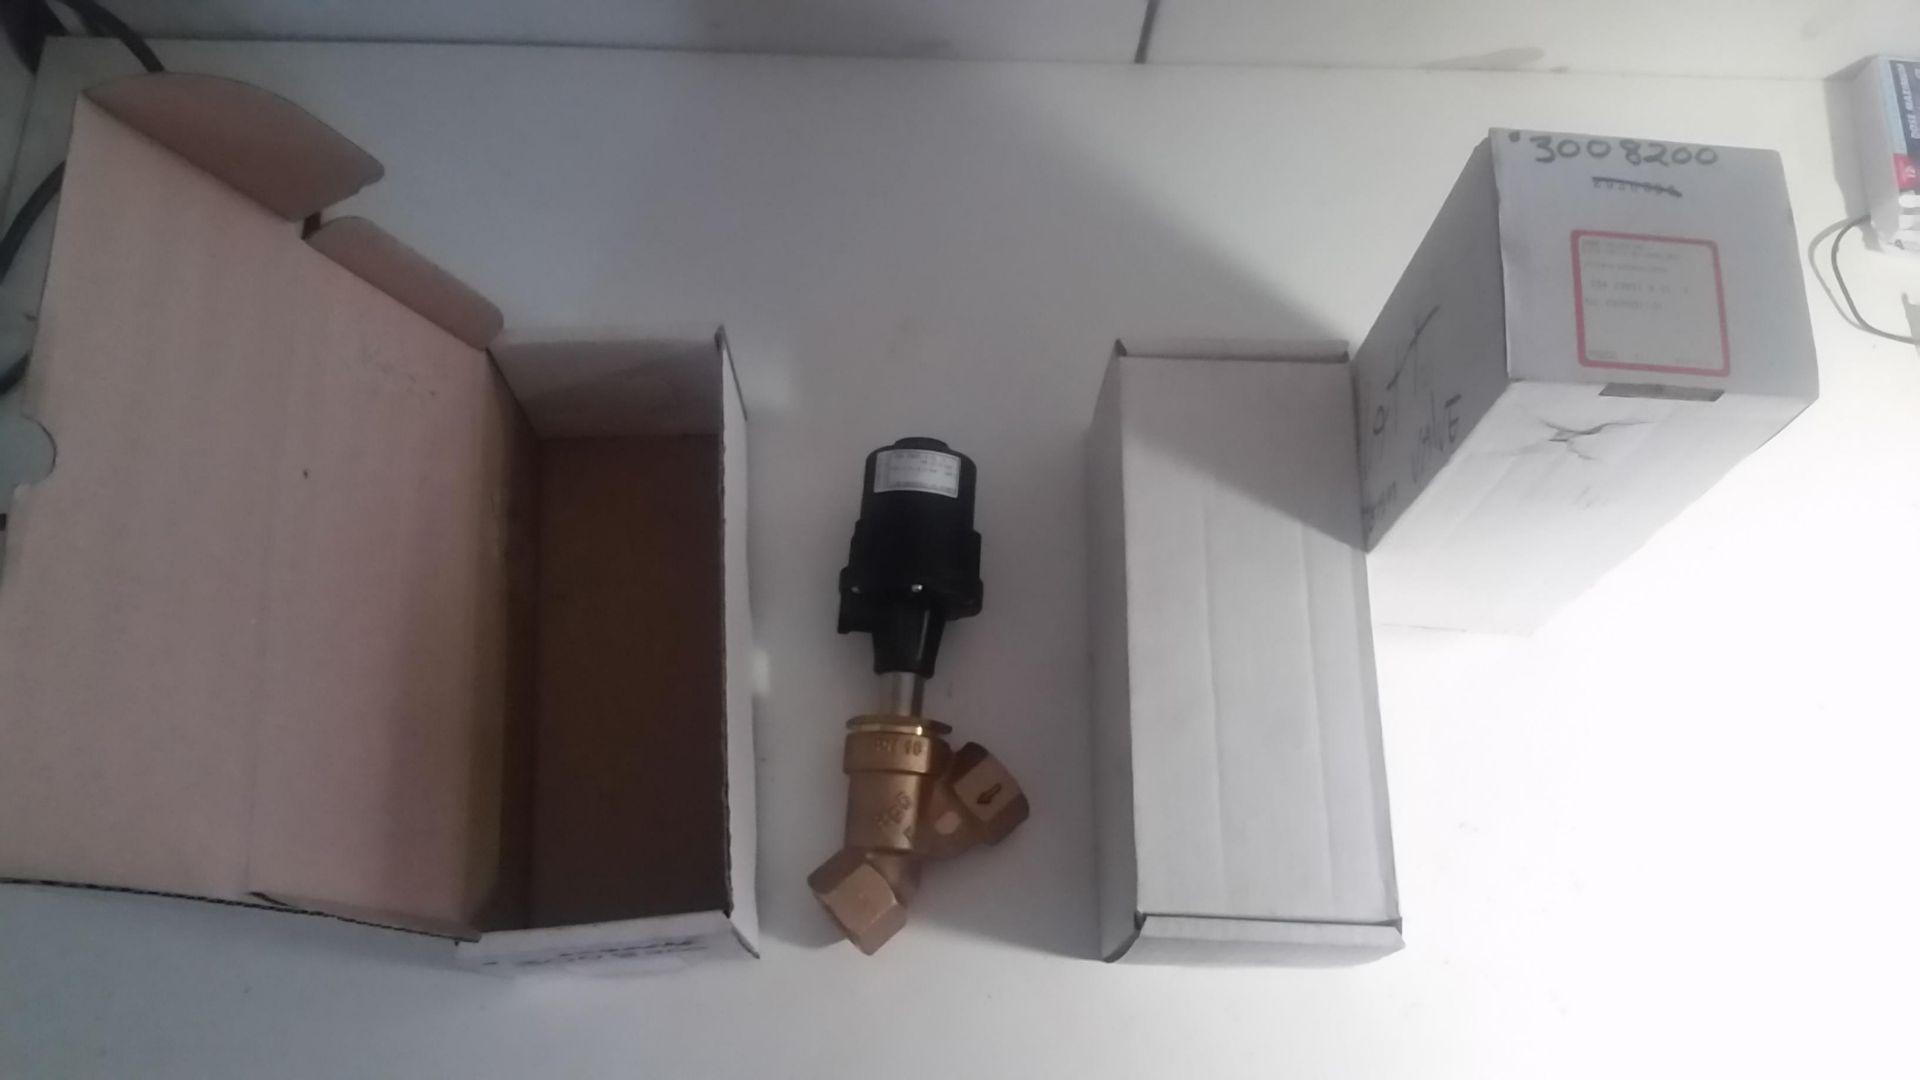 (1) LOT (3) Gemu Valves, NEW in Boxes, - LOCATION - LONDON, ONTARIO